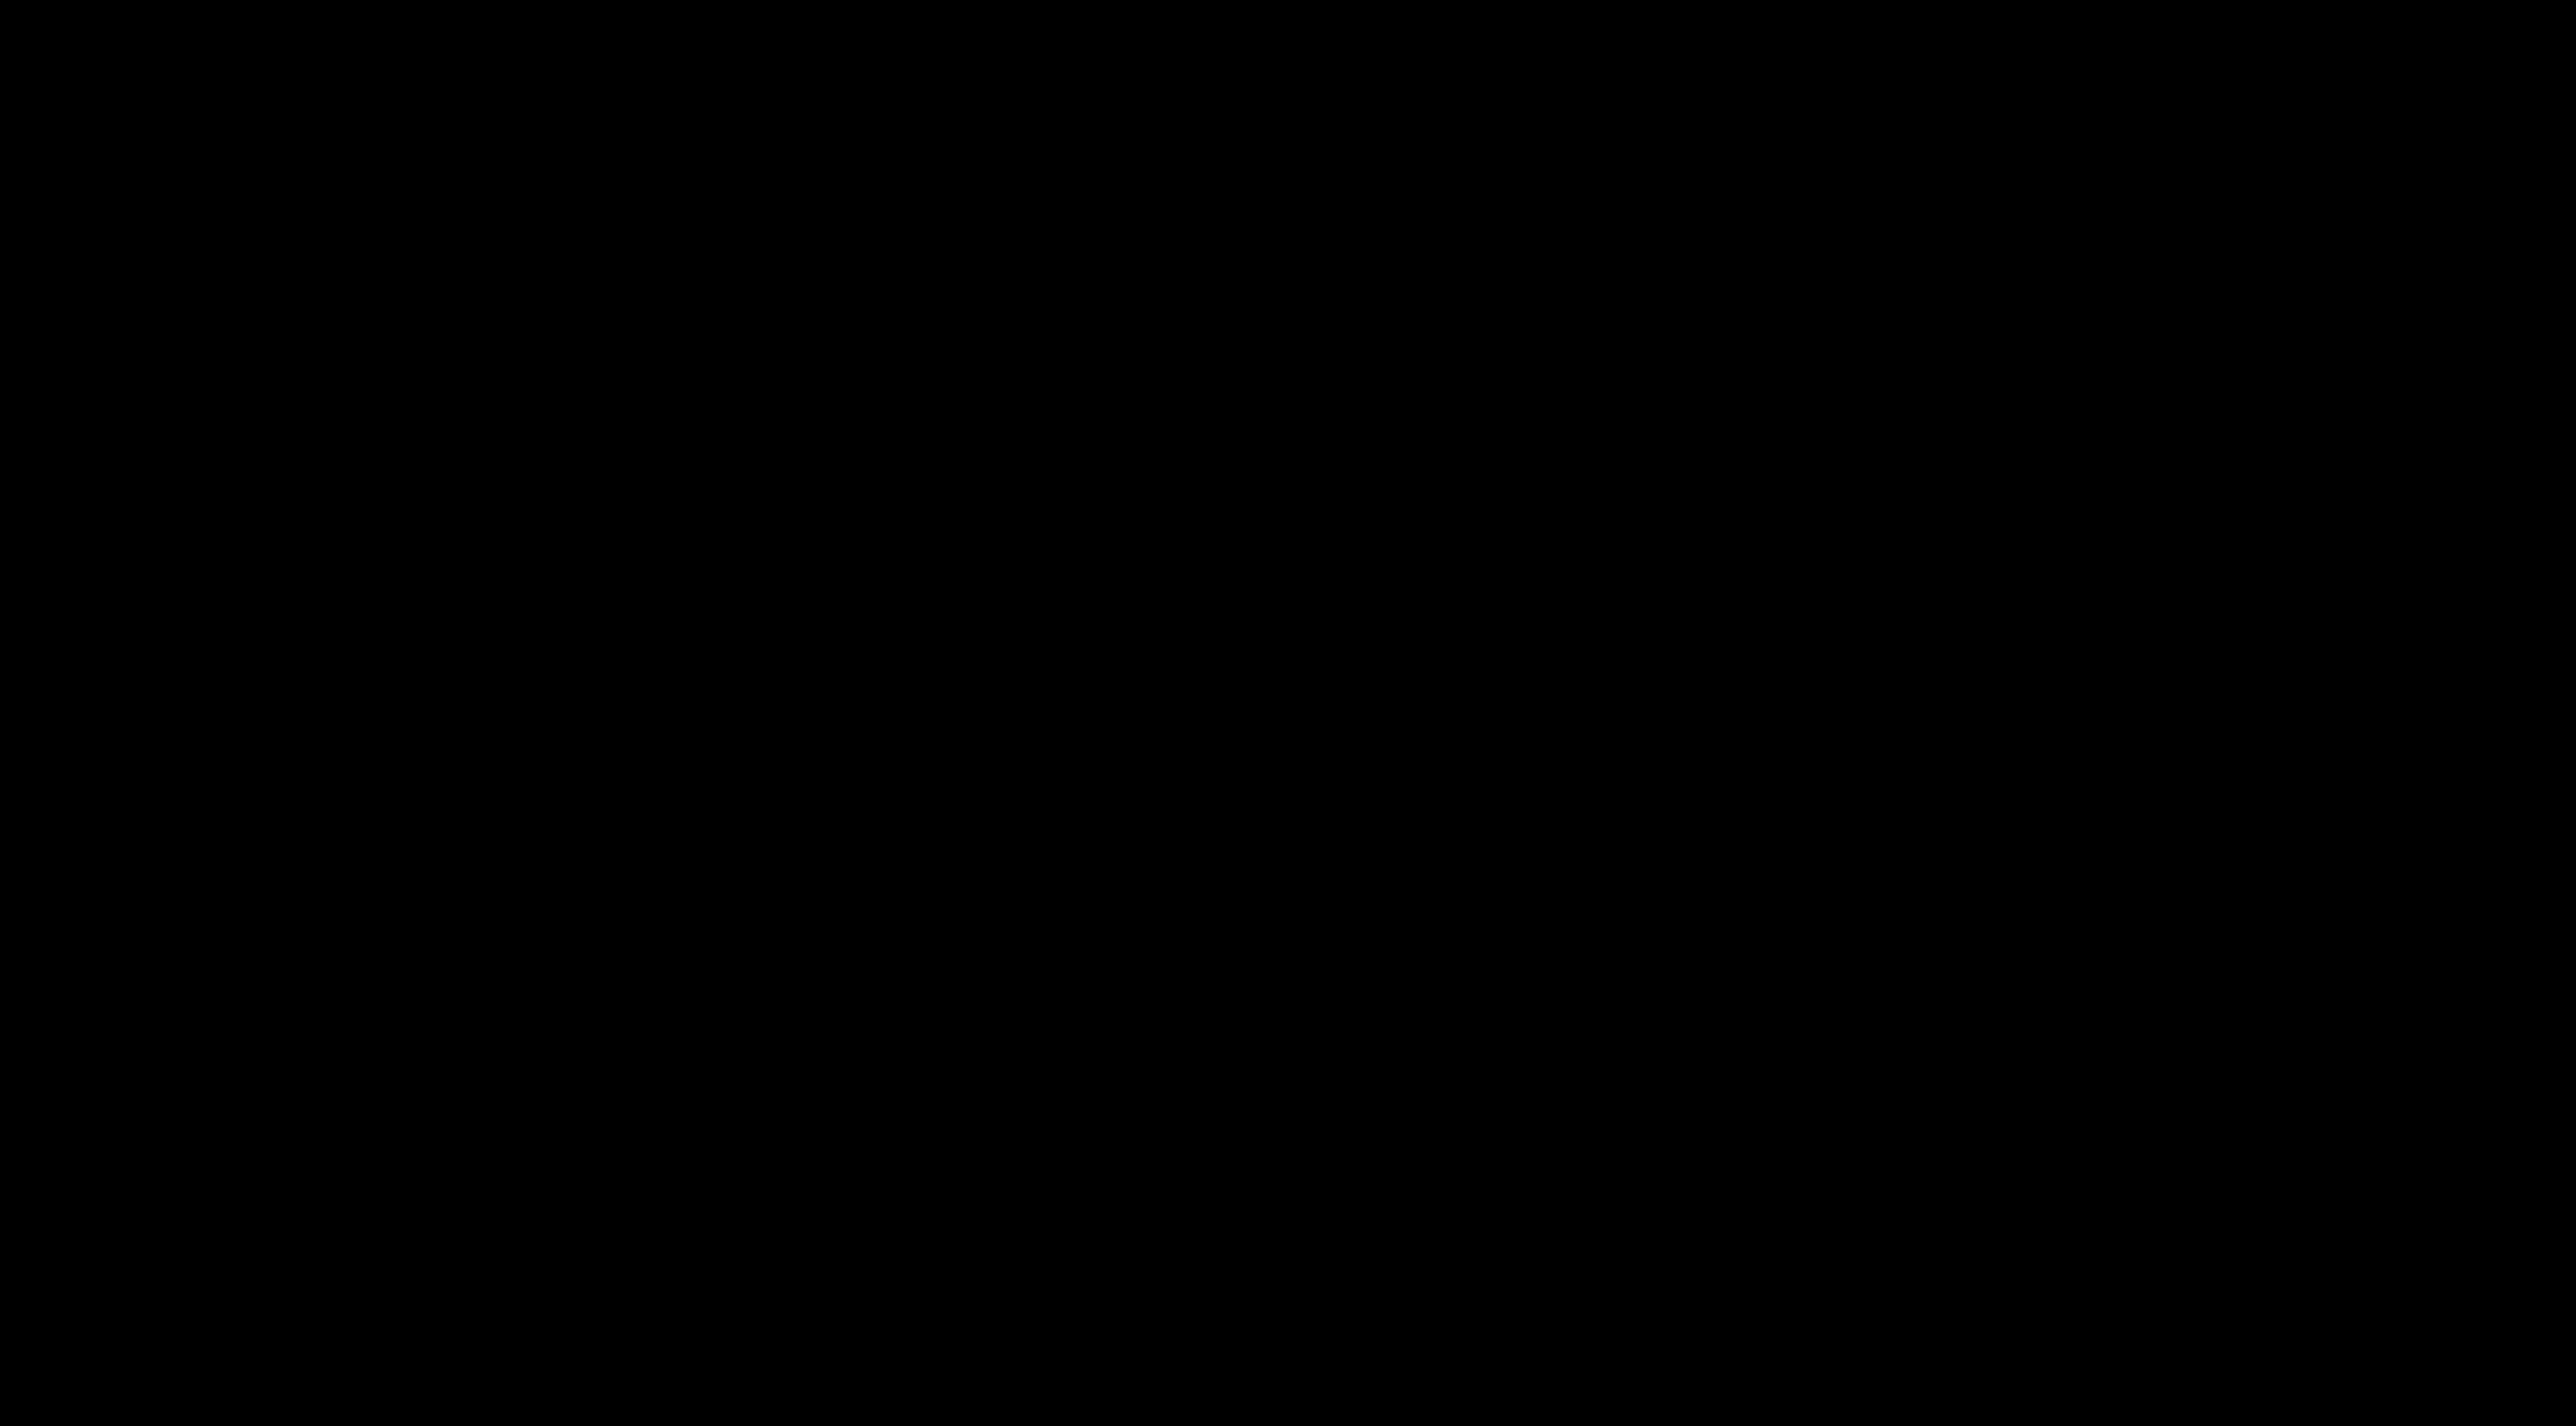 SUHYEON HAN